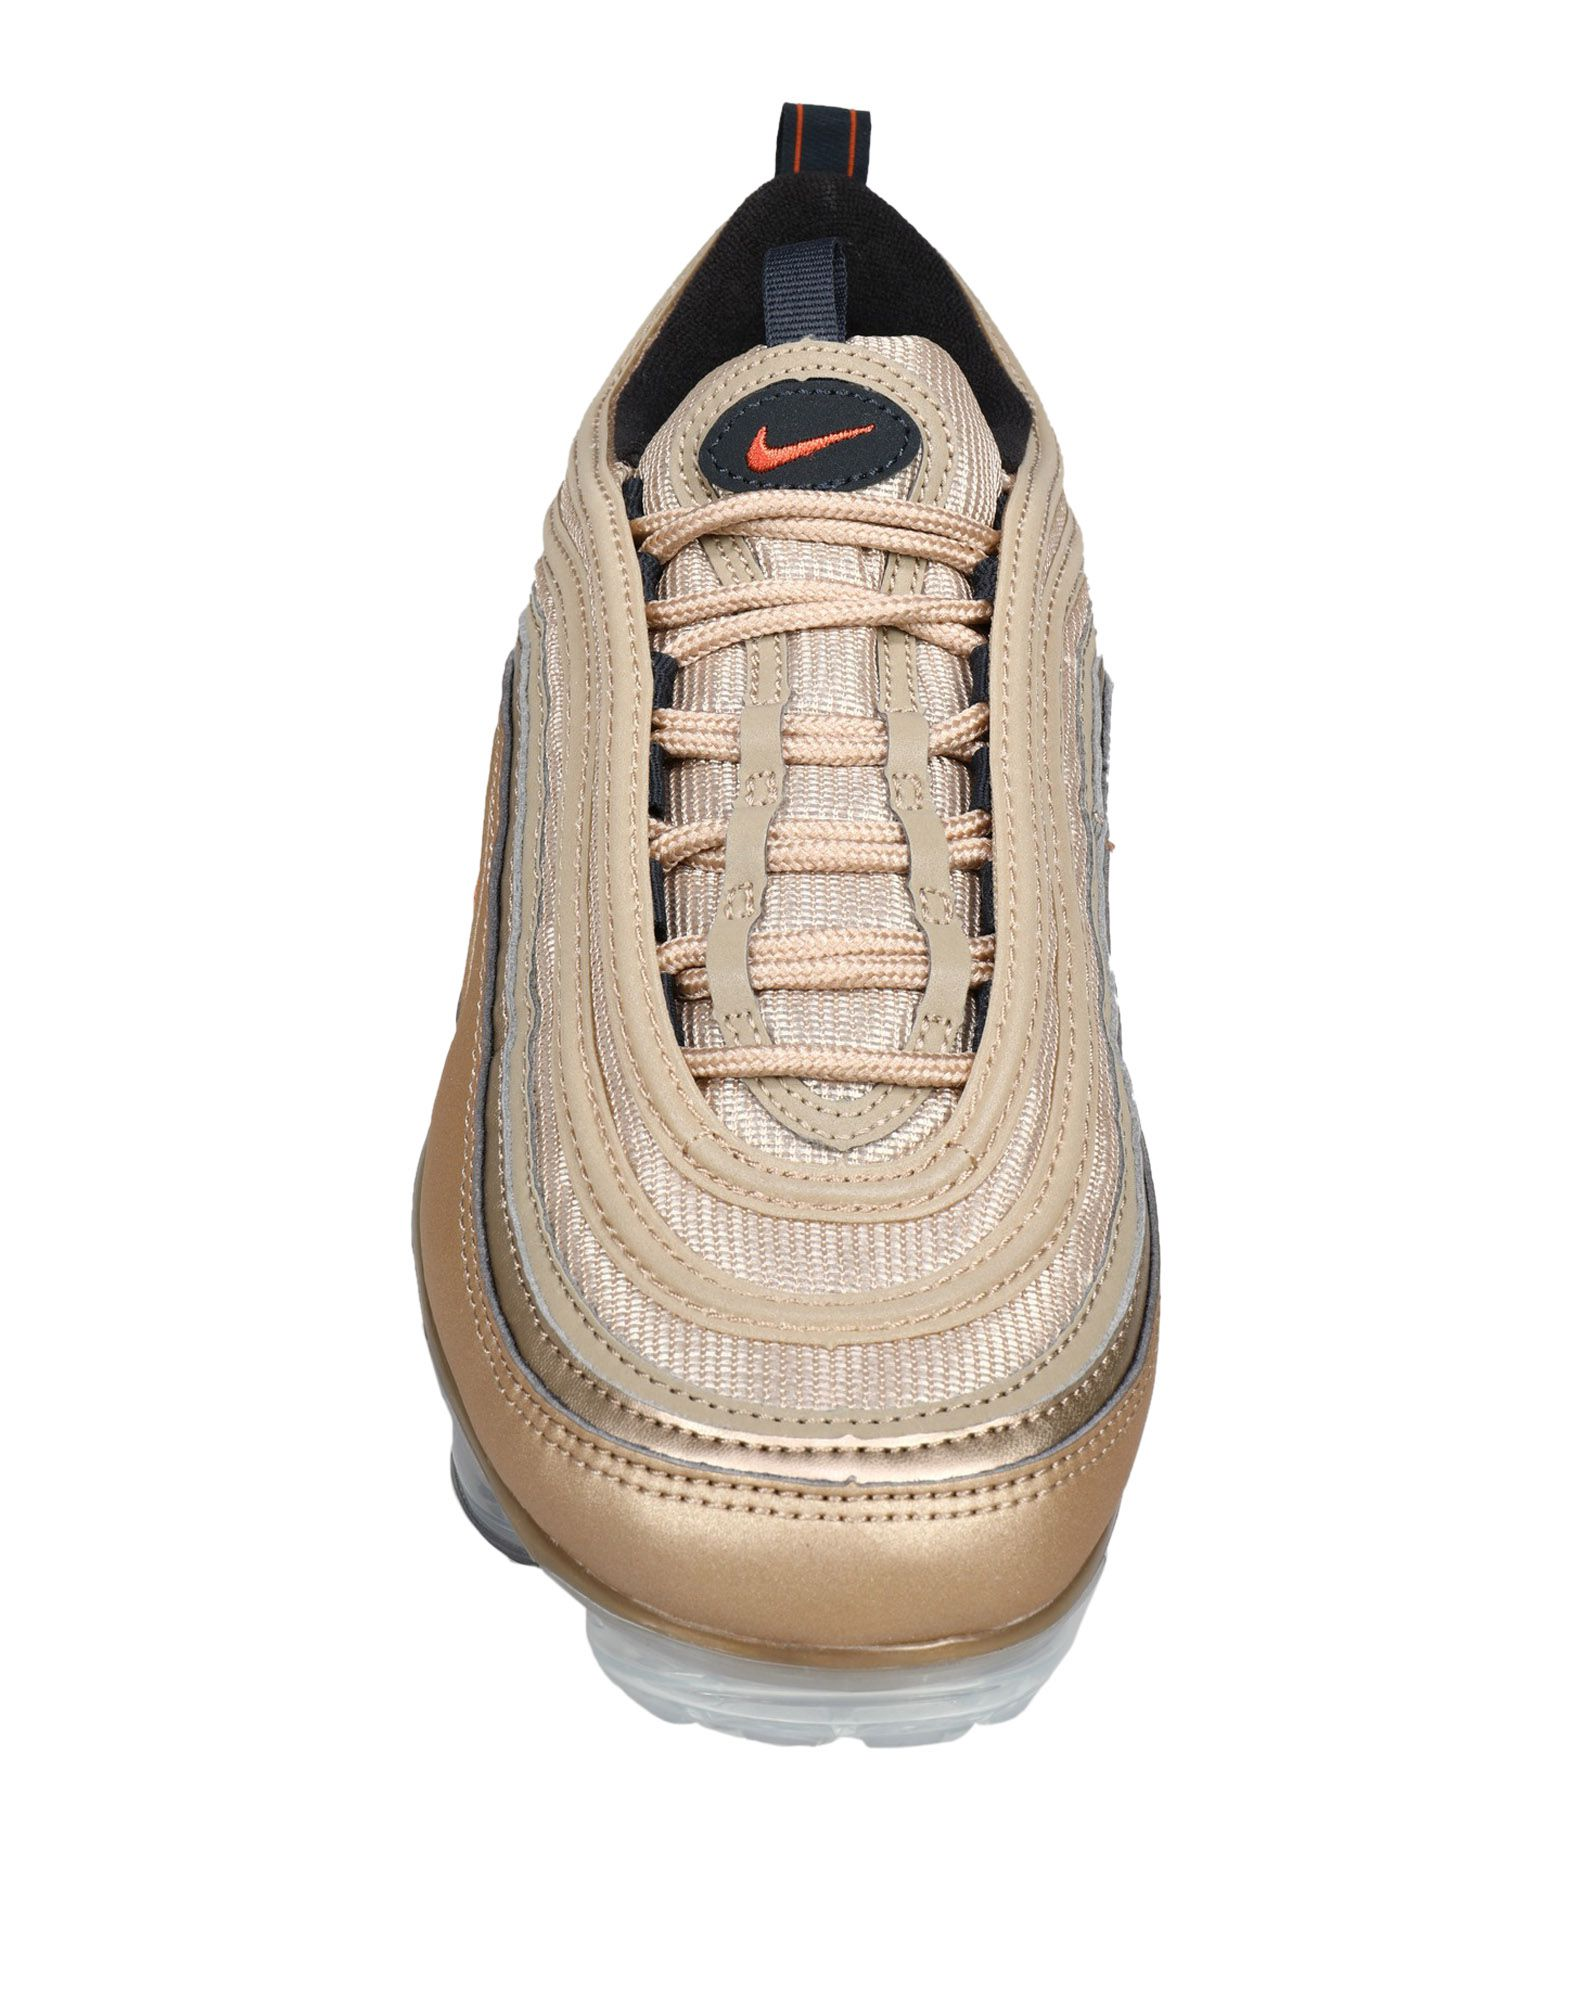 Rabatt Schuhe 11533918CB Nike Air Vapormax 97 11533918CB Schuhe 946840